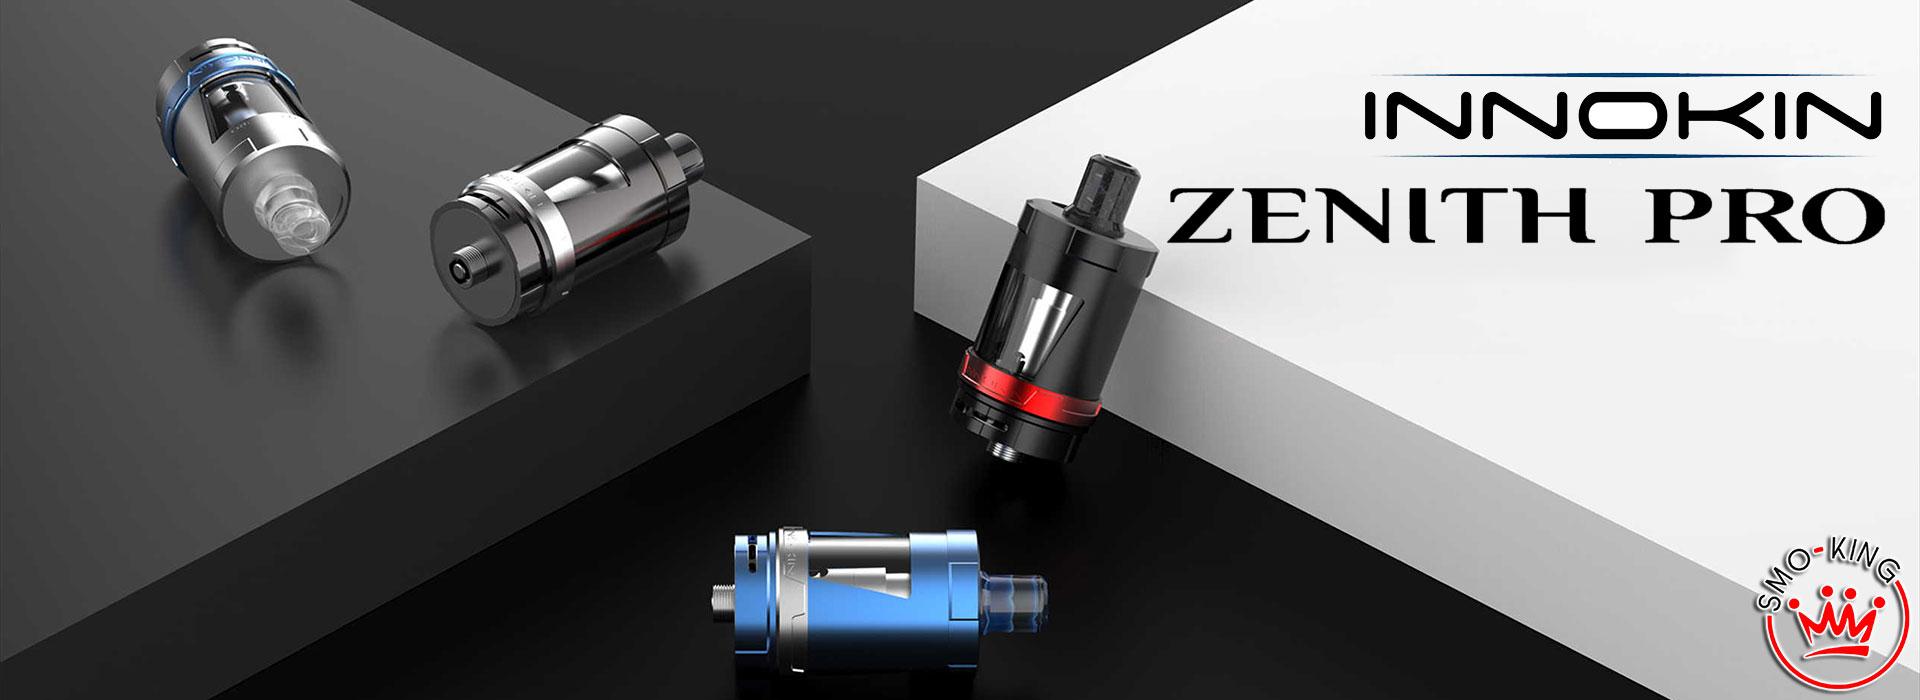 Zenith Pro